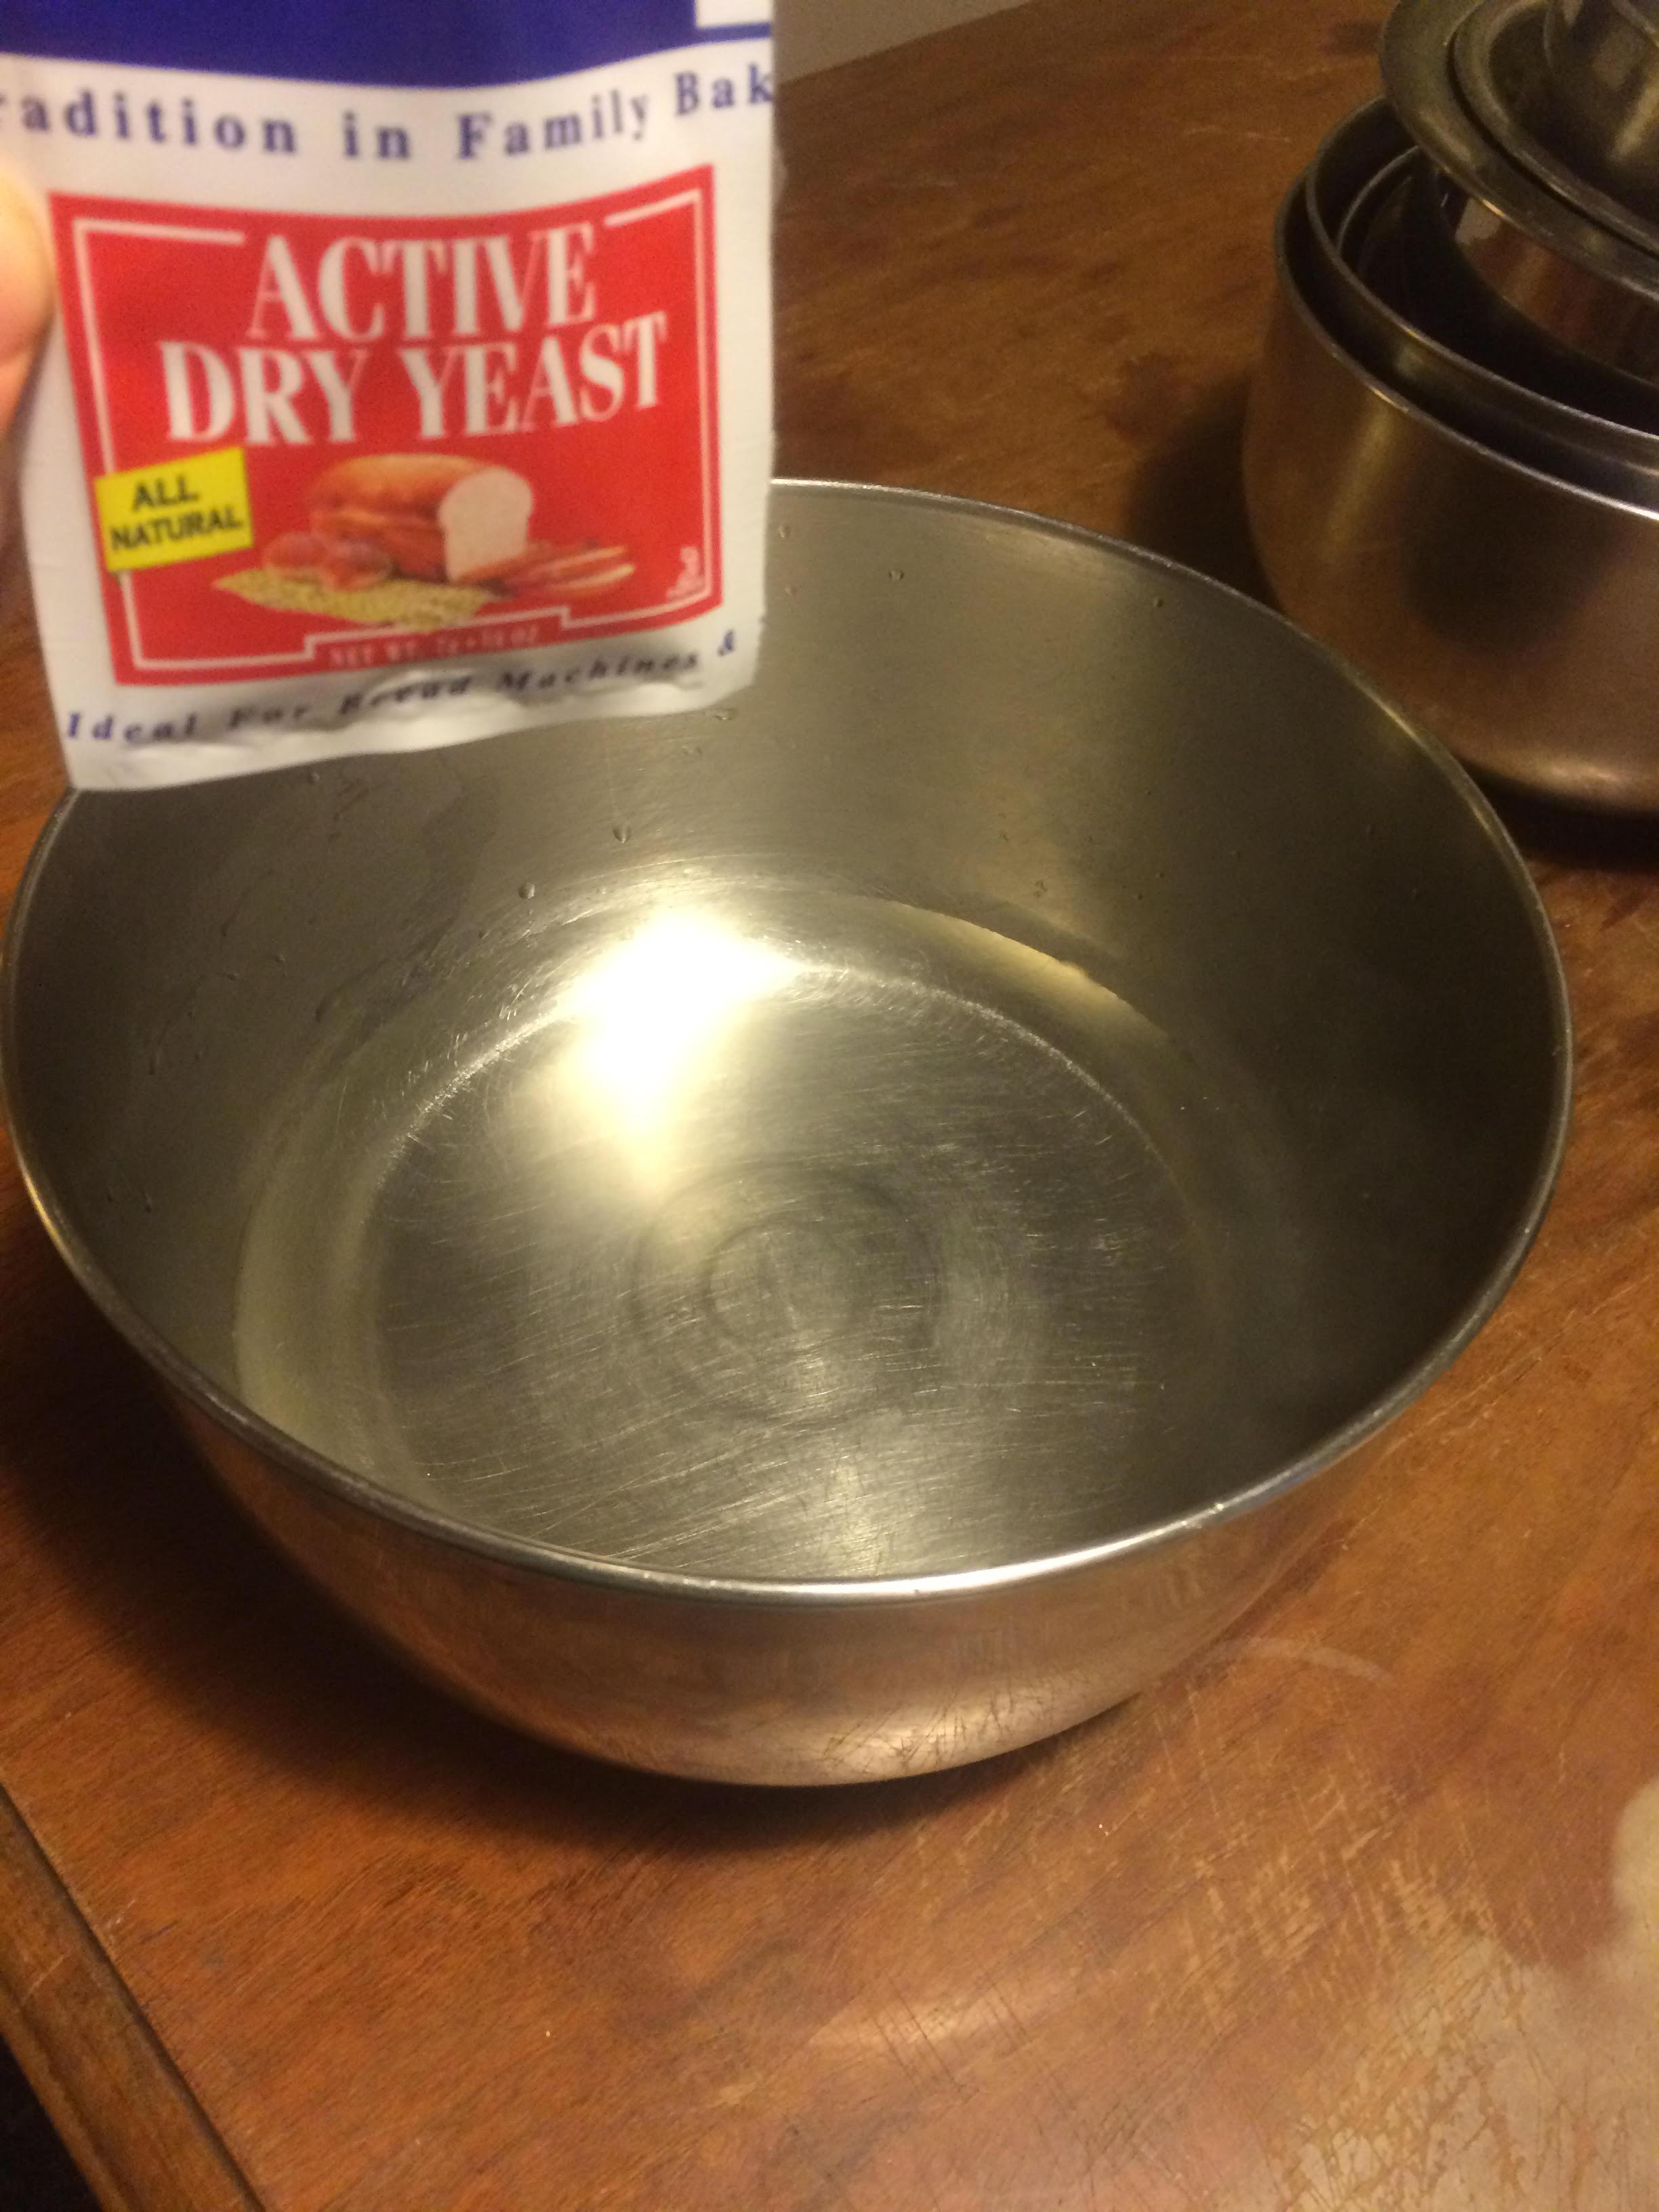 Adding Yeast to Warm Water